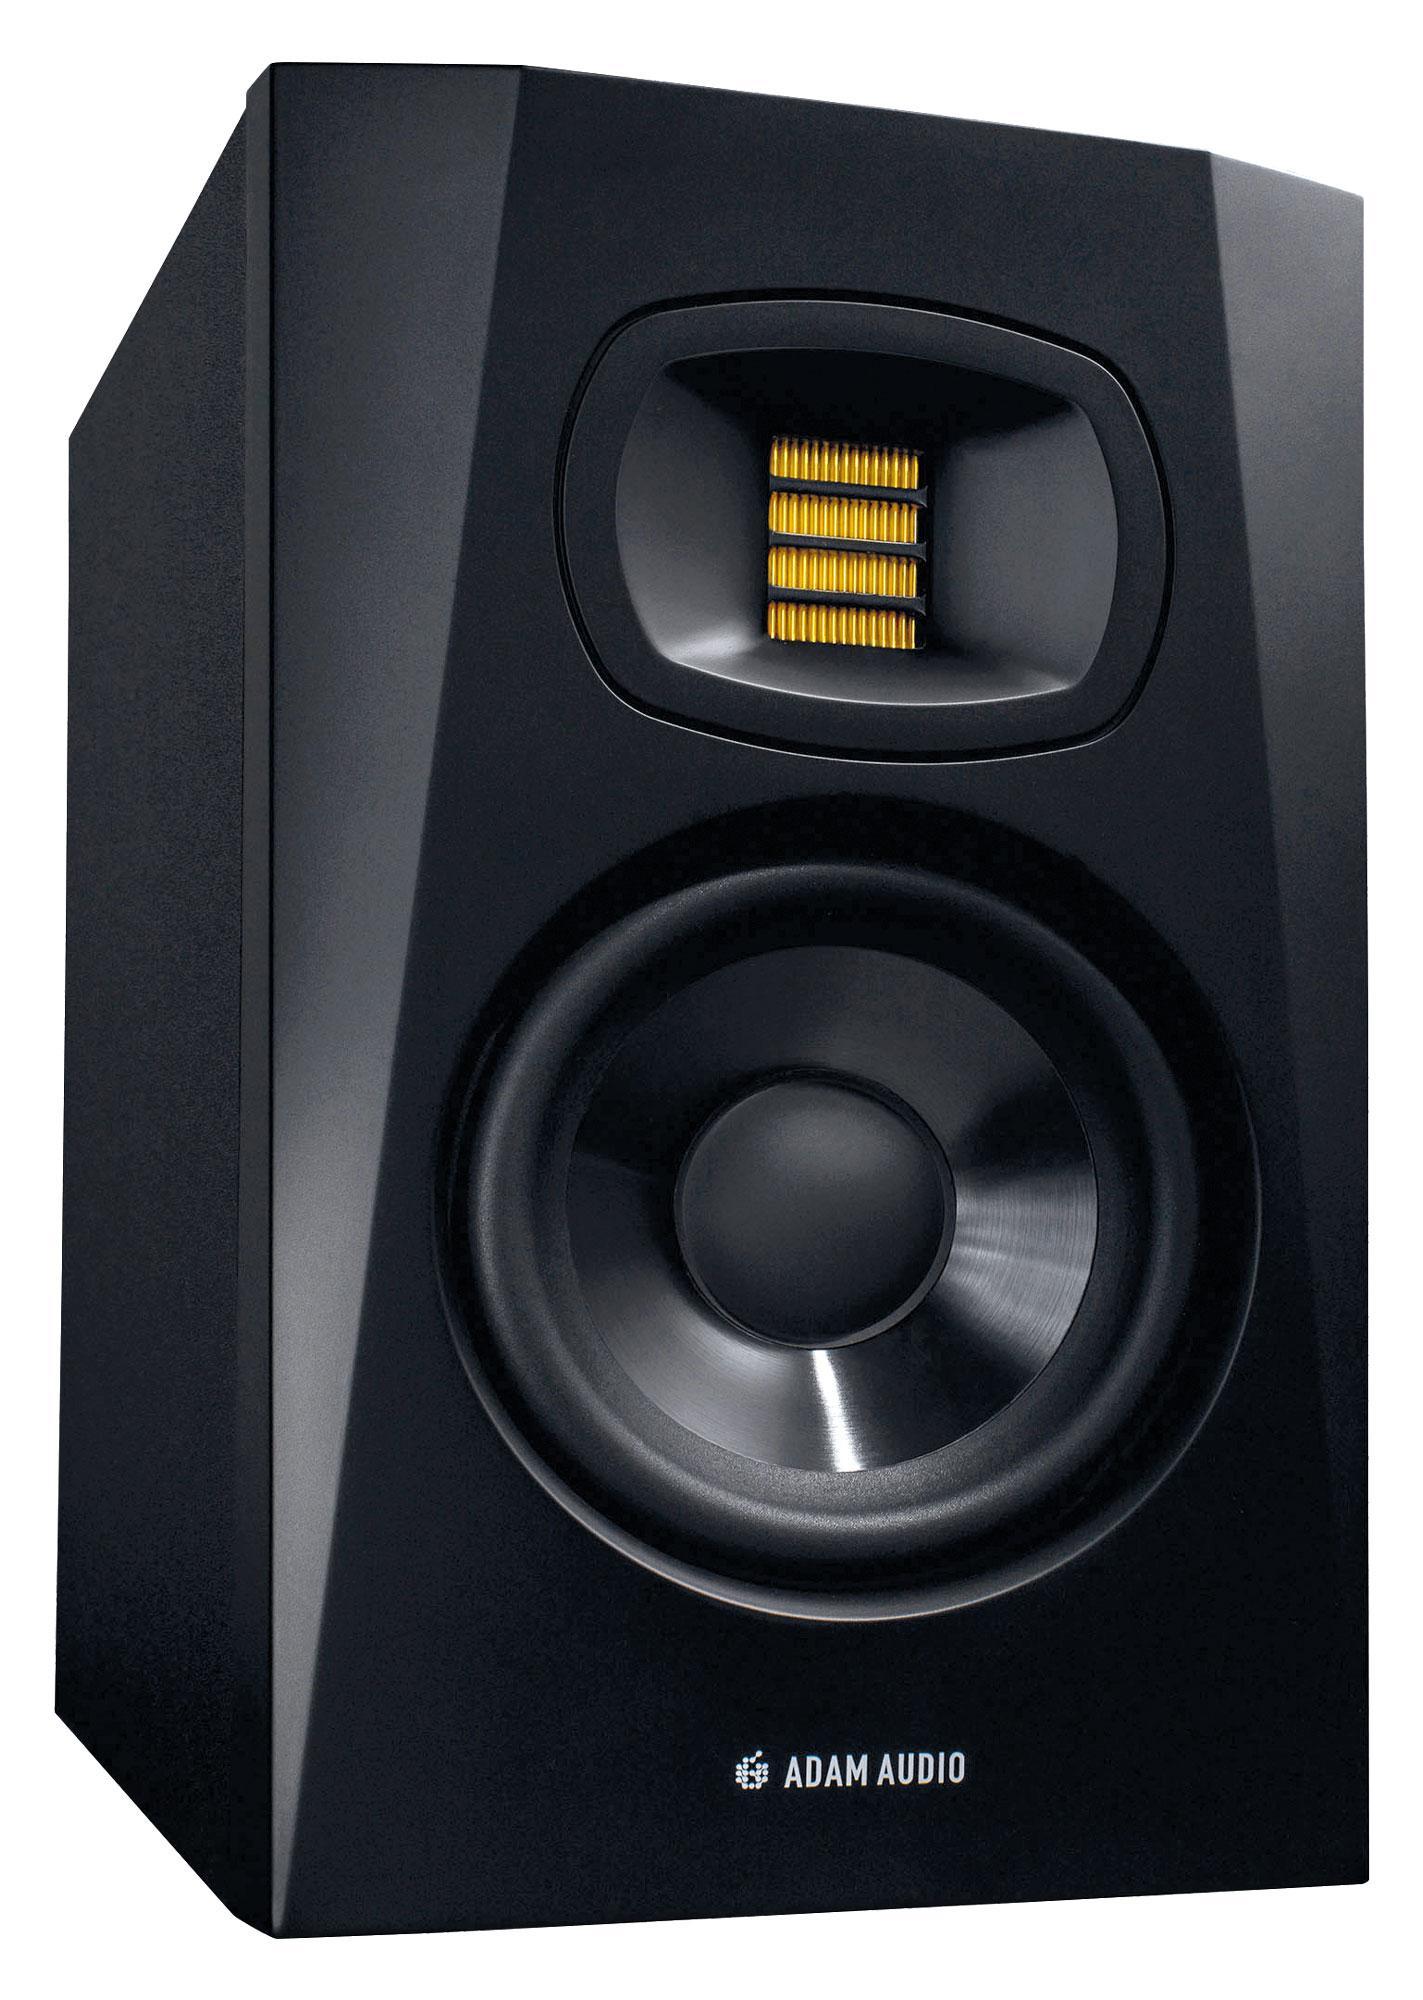 Studiomonitore - Adam Audio T5V - Onlineshop Musikhaus Kirstein